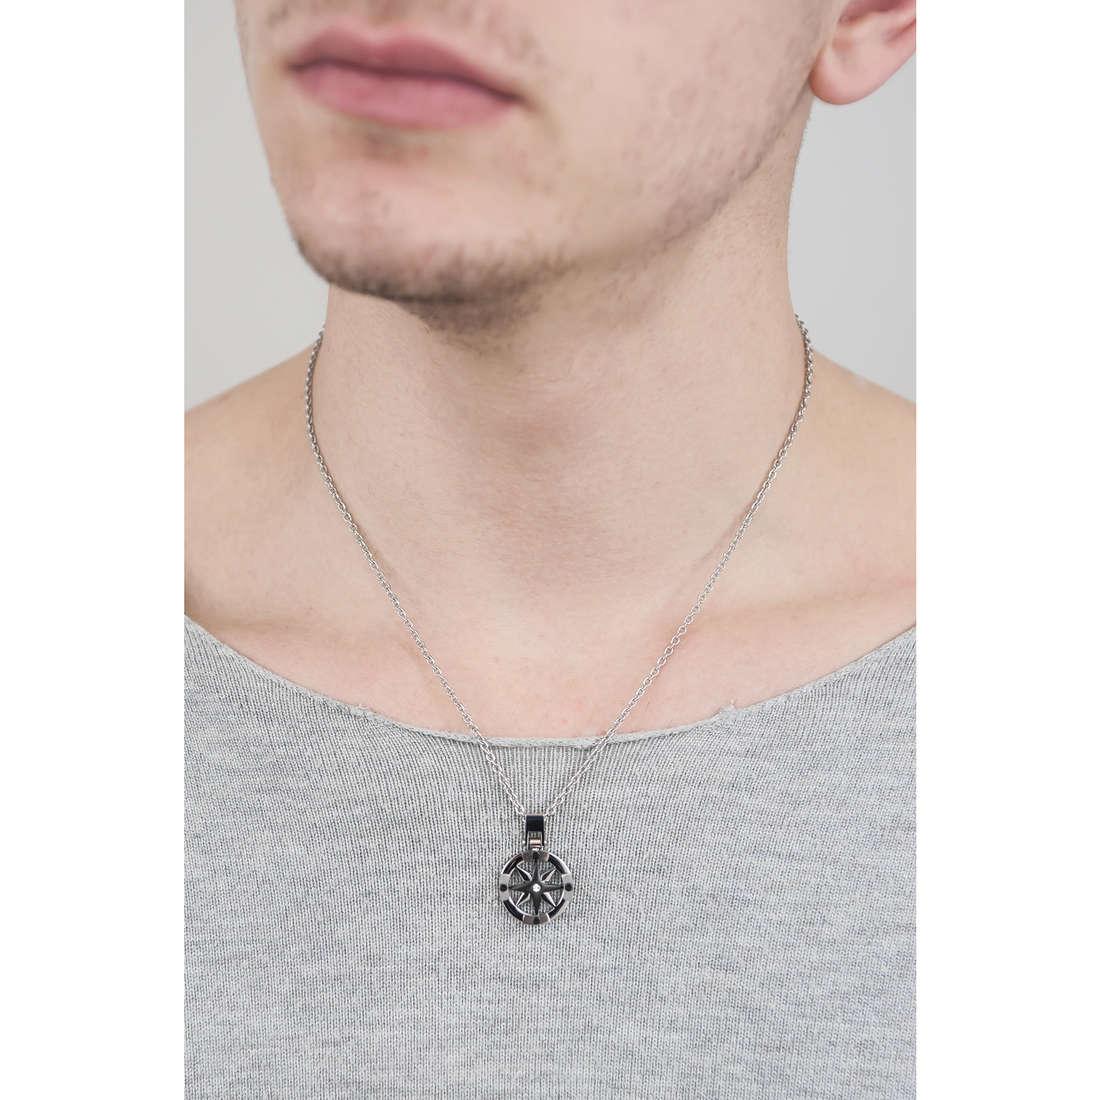 Sector necklaces Marine man SADQ01 indosso